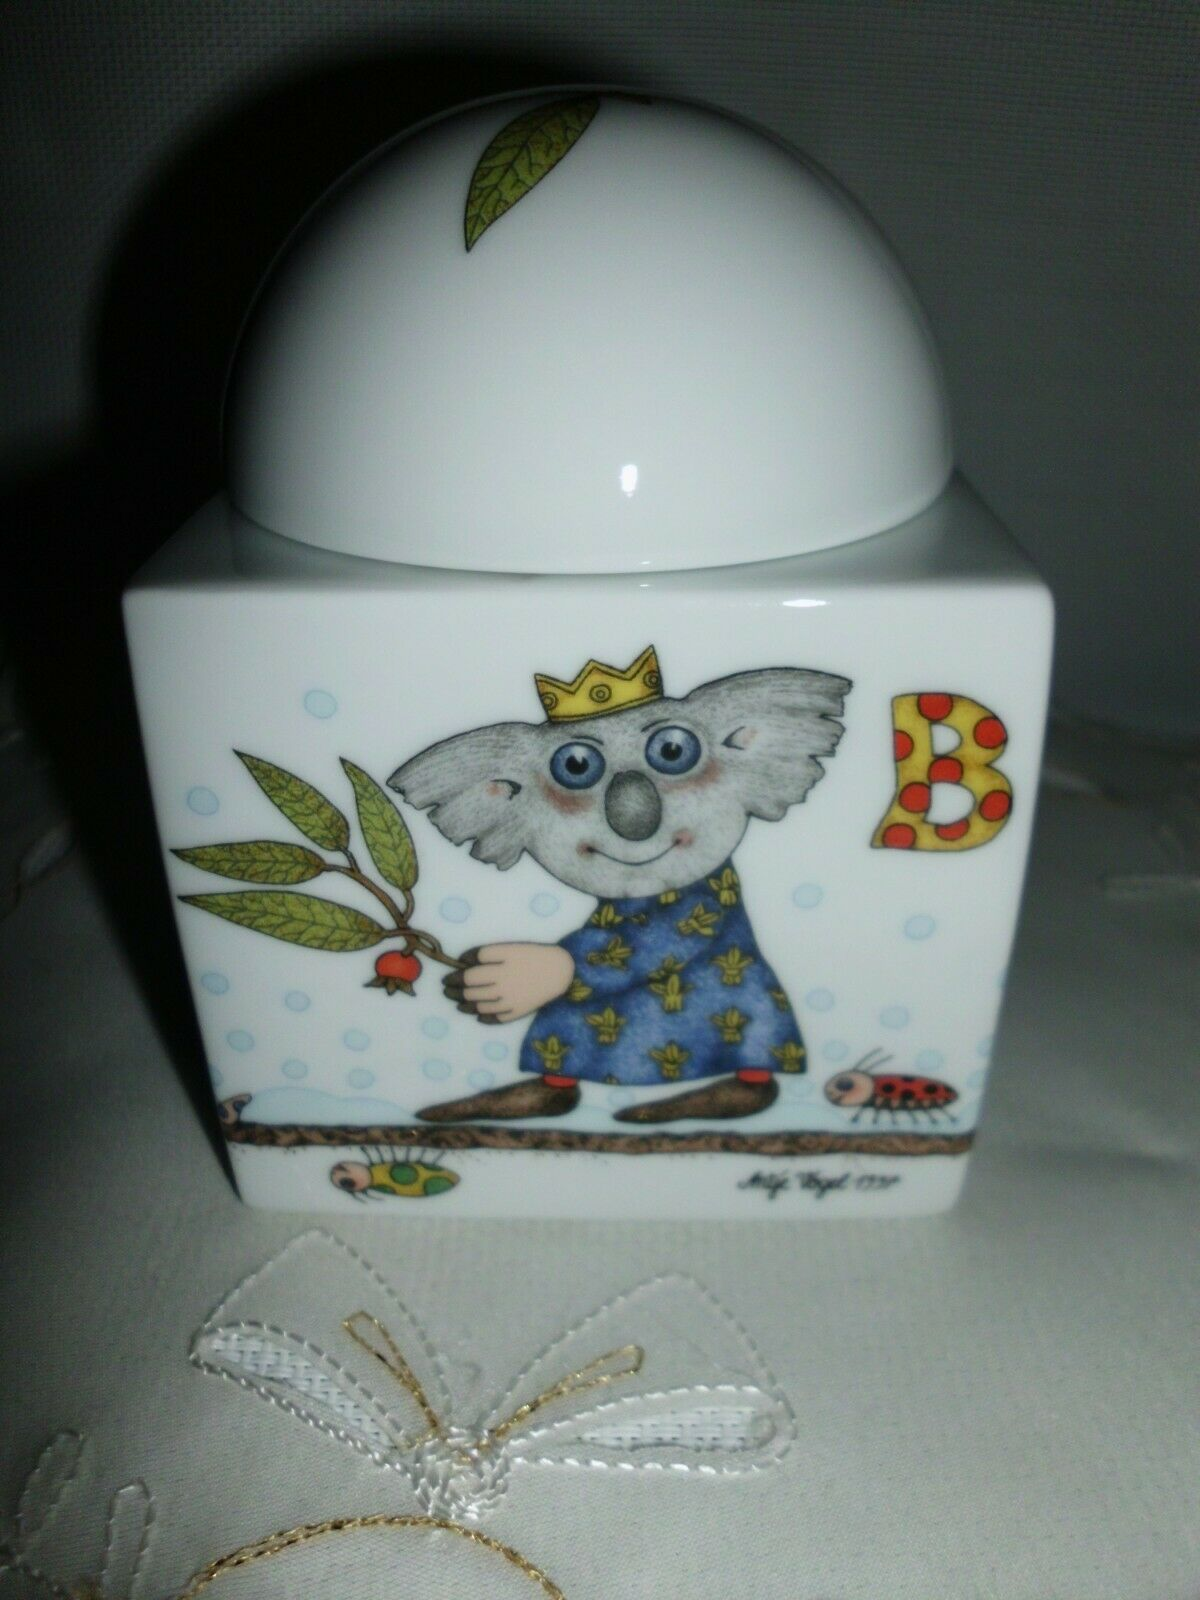 Arzberg Weihnachten im Koala Klub 1 Bonboniere - Dose   Heilige 3 Könige  neu